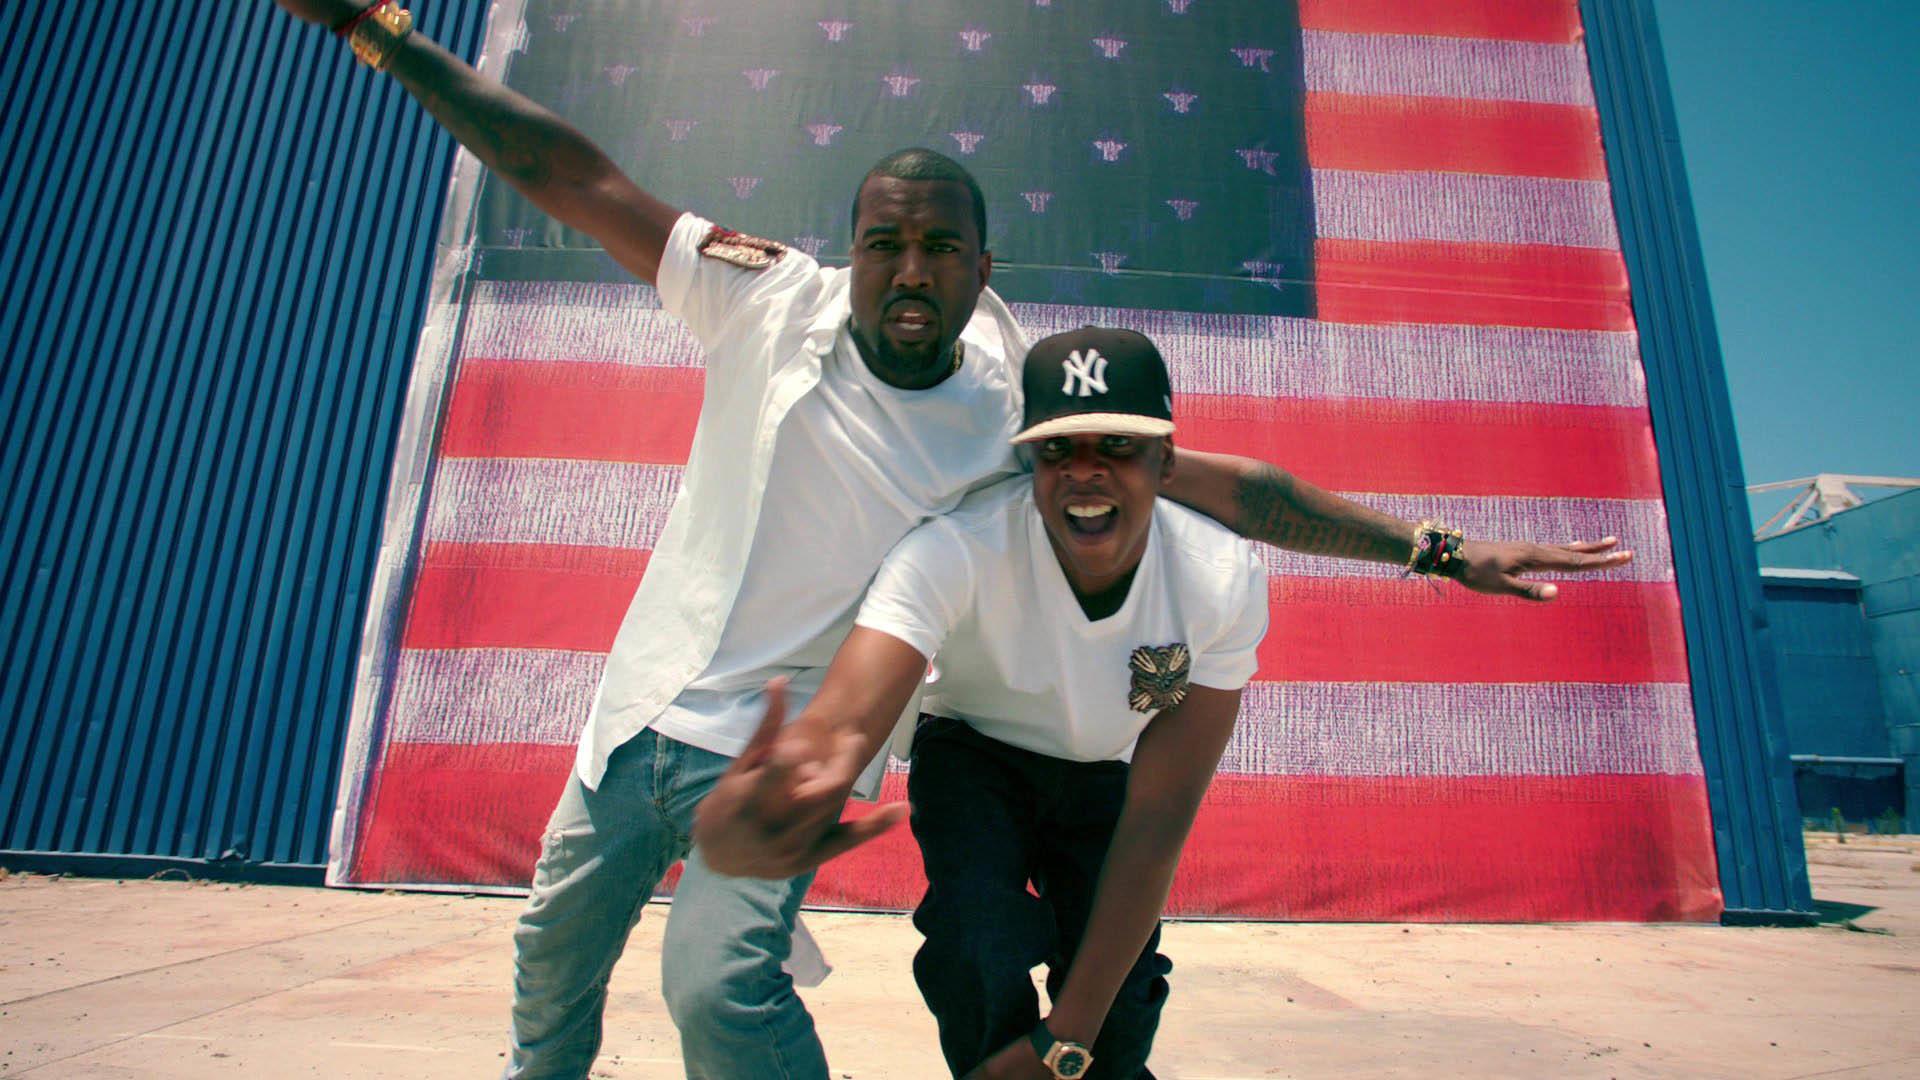 Jay Z & Kanye West – Otis wallpaper